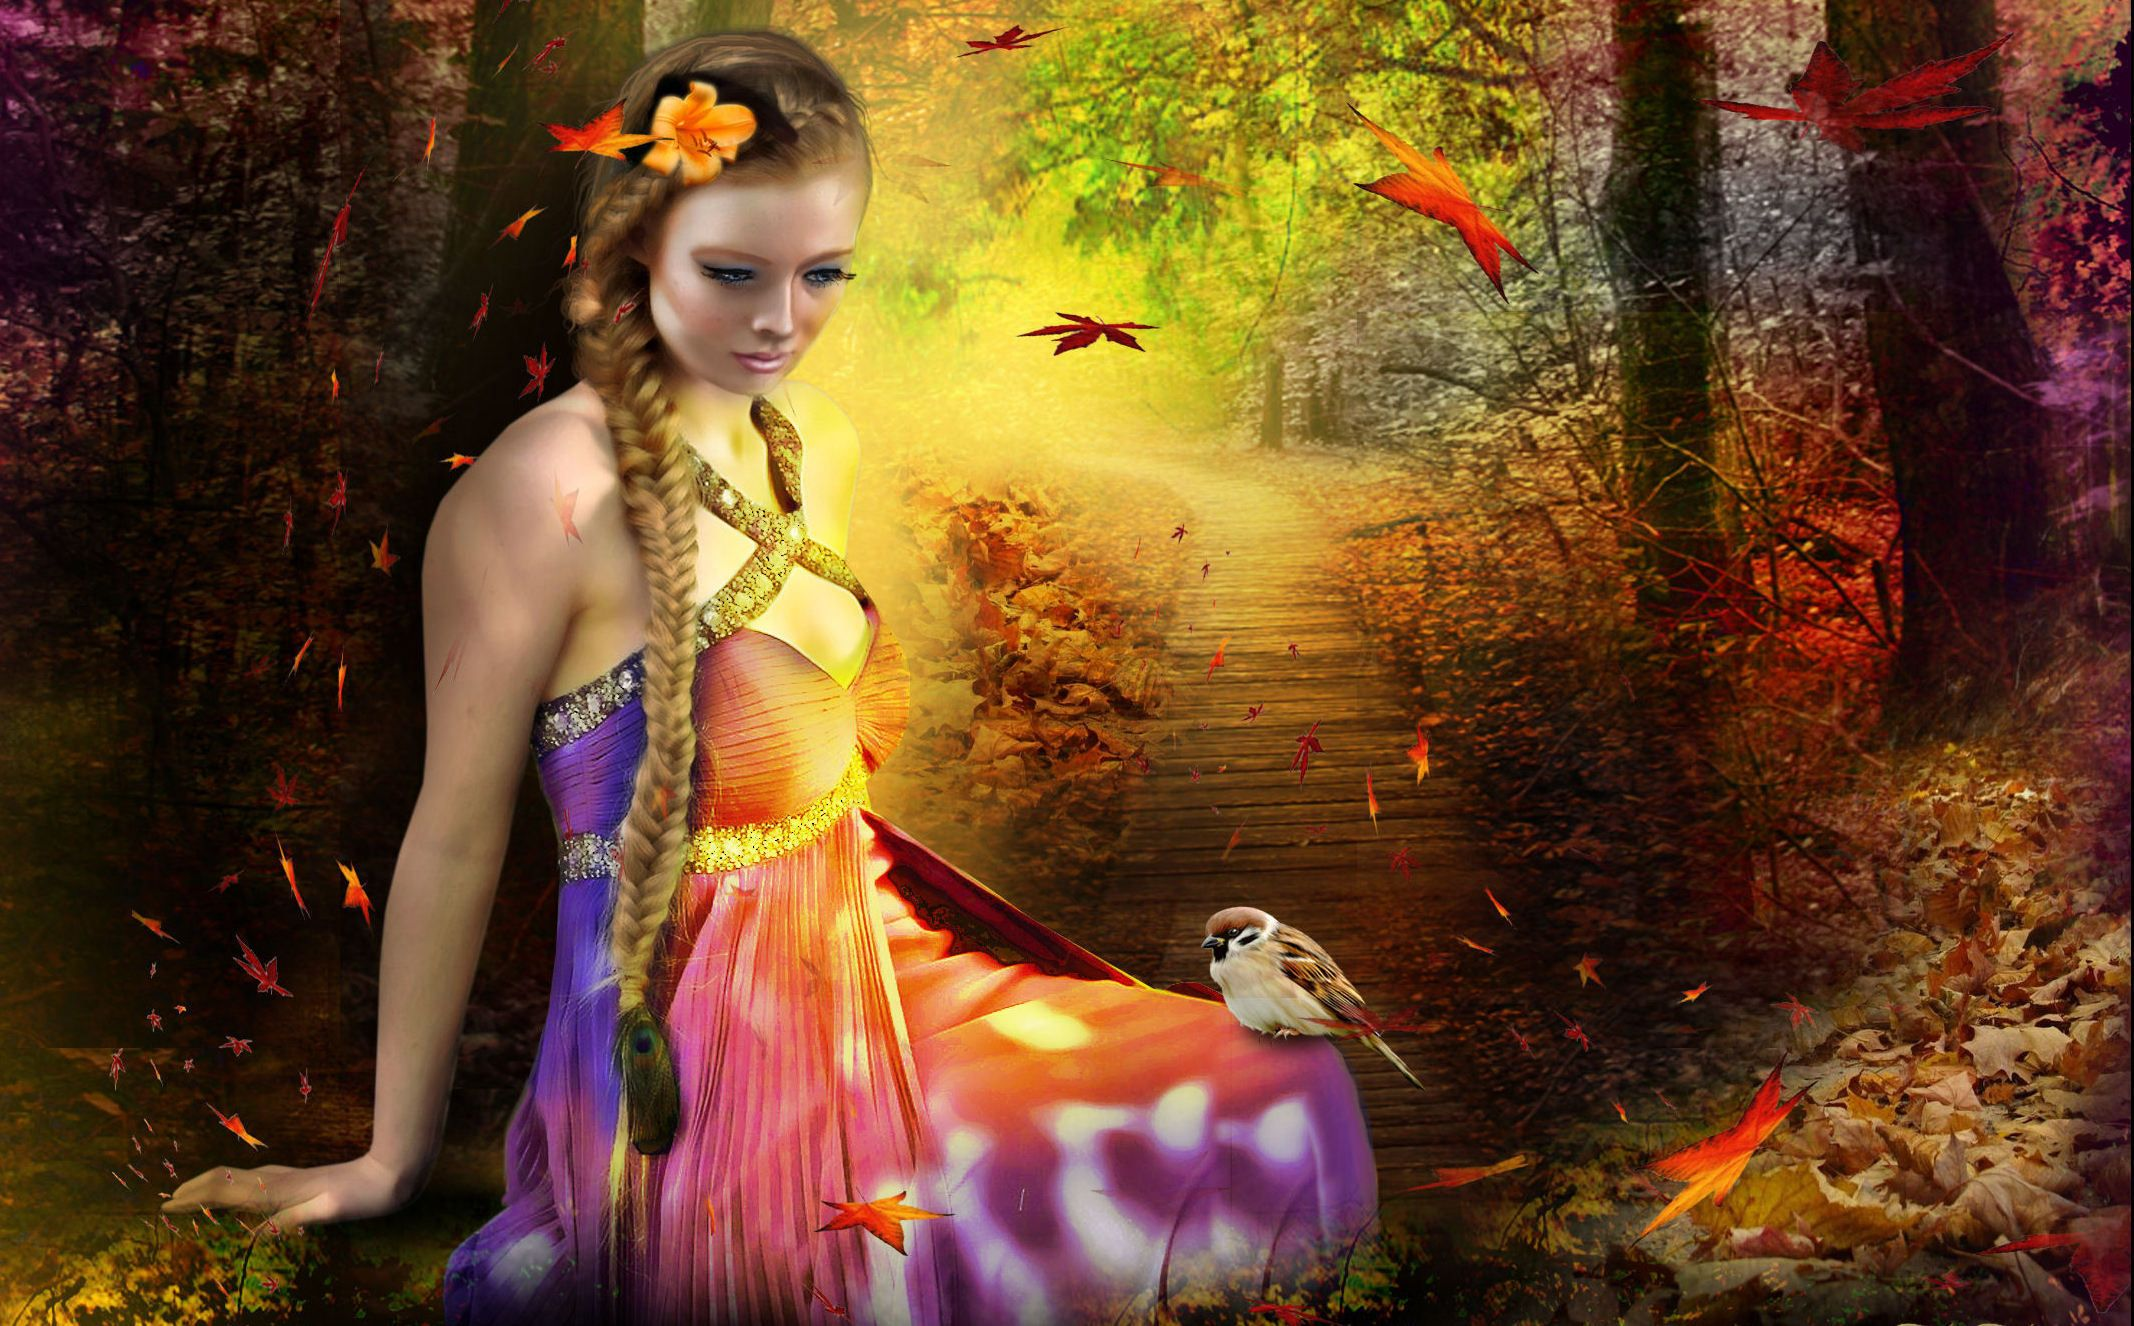 Fantasy girl image hdwallpapersok pinterest fantasy girl image voltagebd Gallery